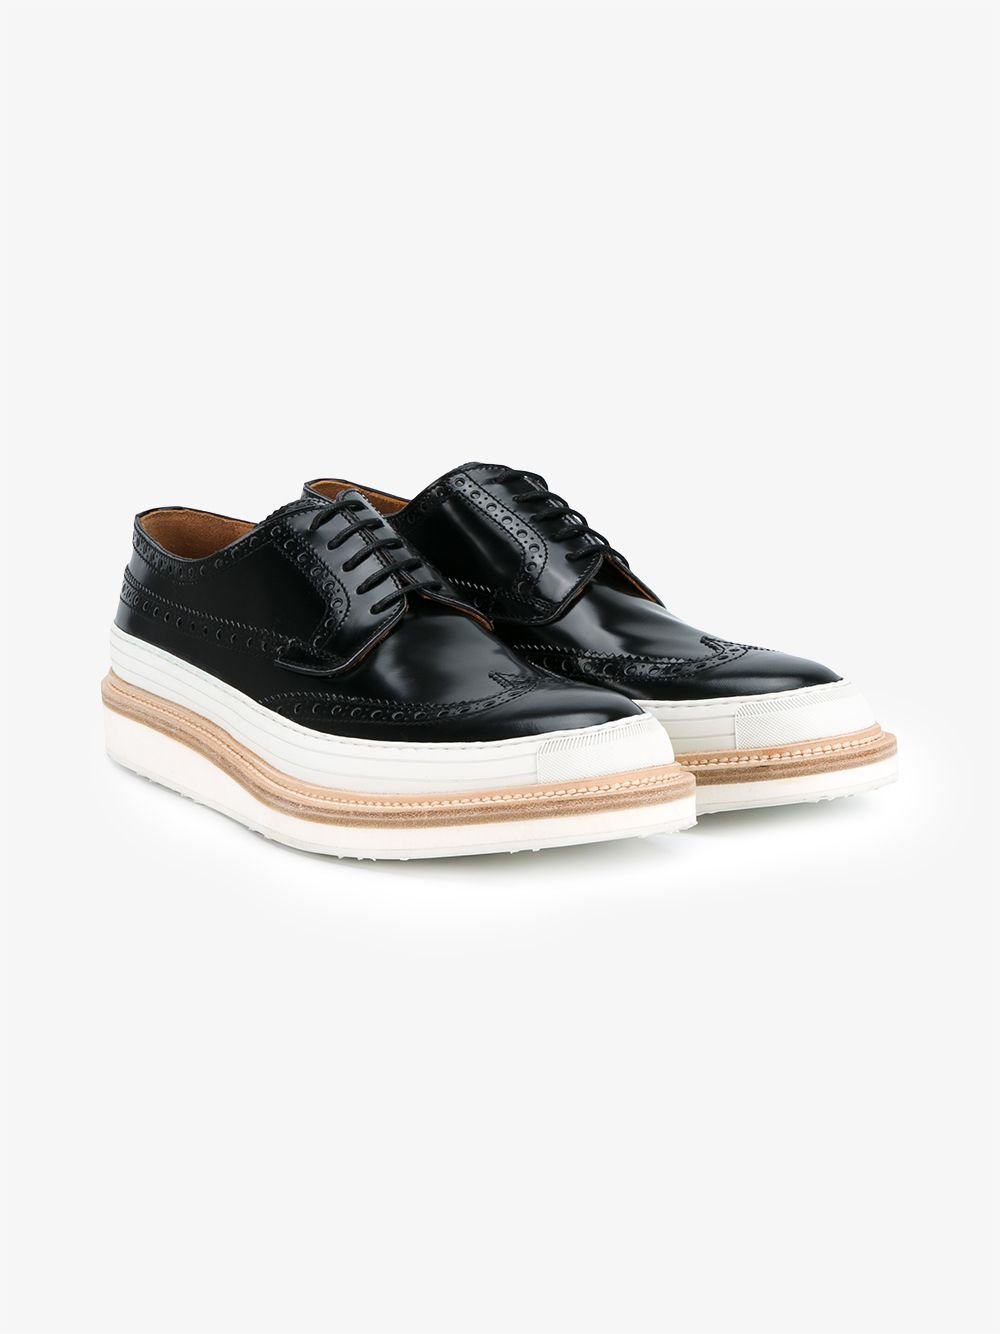 WEBERHODELFEDER Hartford Leather Wedge Shoes